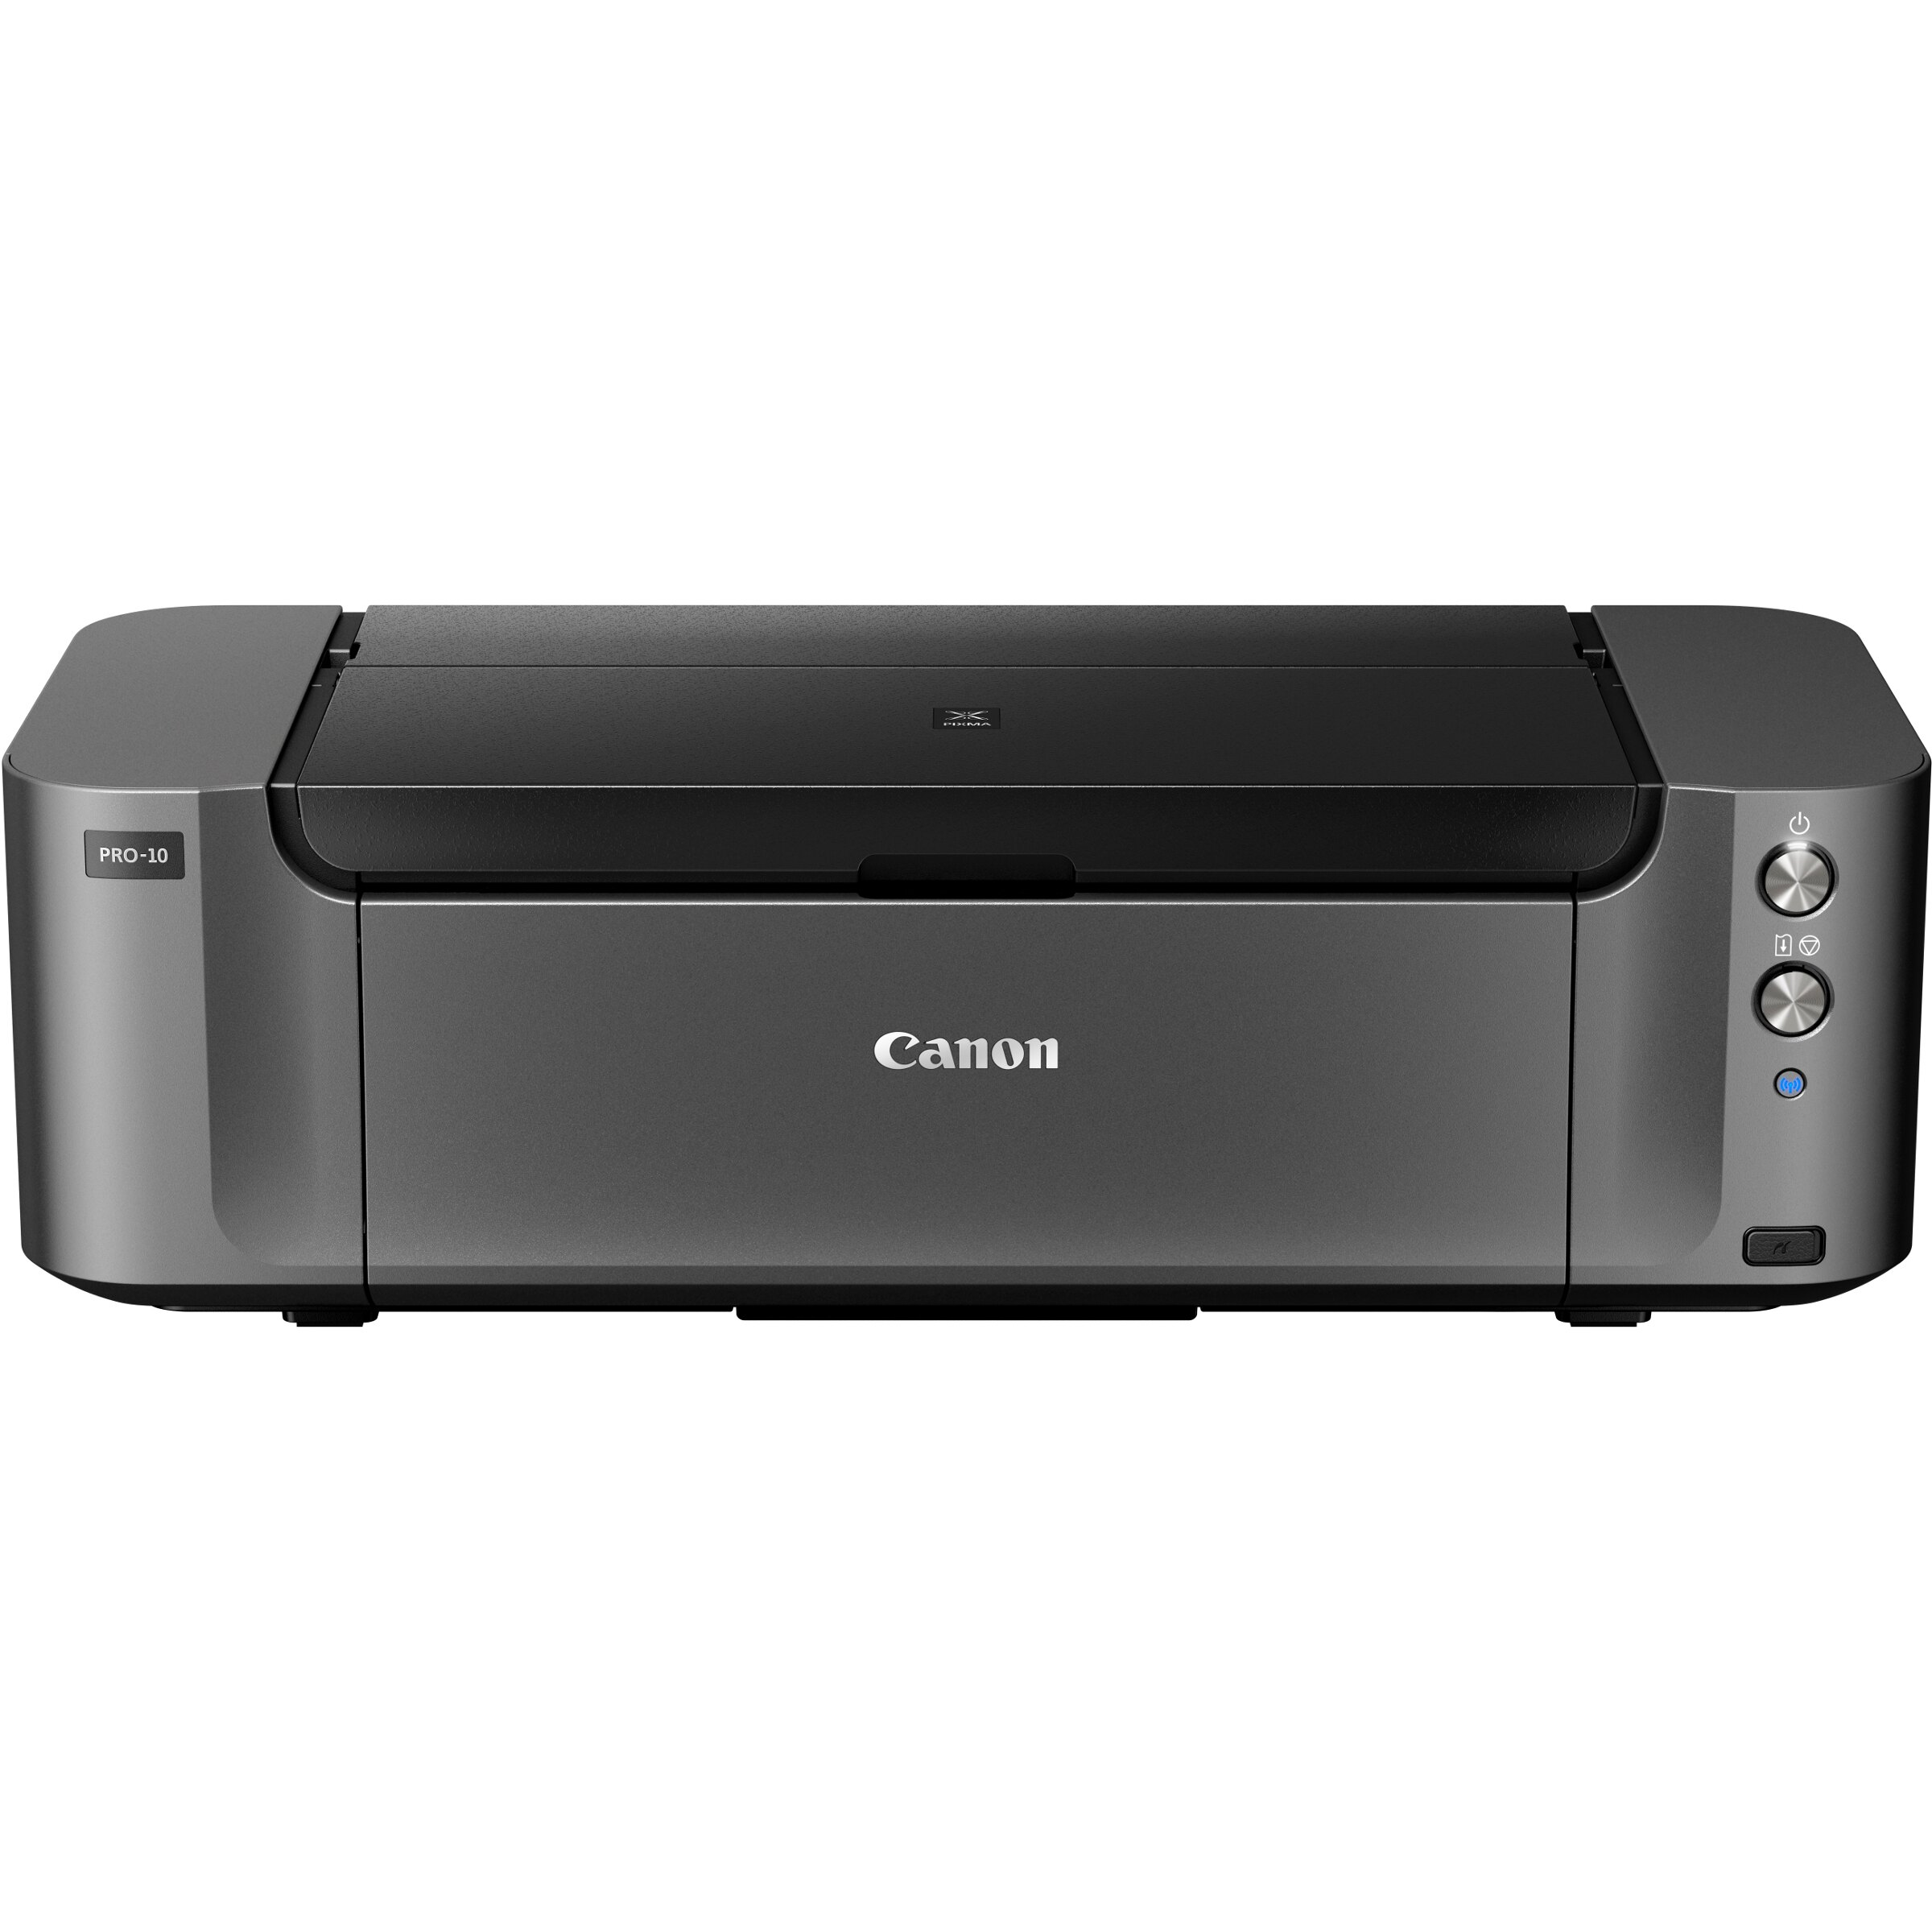 Canon PIXMA Pro PRO-10 Inkjet Printer - Color - 4800 x 2400 dpi Print - Photo/Disc Print - Desktop - 3.6 Second Photo - 150 sheets Standard Input Capacity - Ethernet - Wireless LAN - USB - PictBridge 1